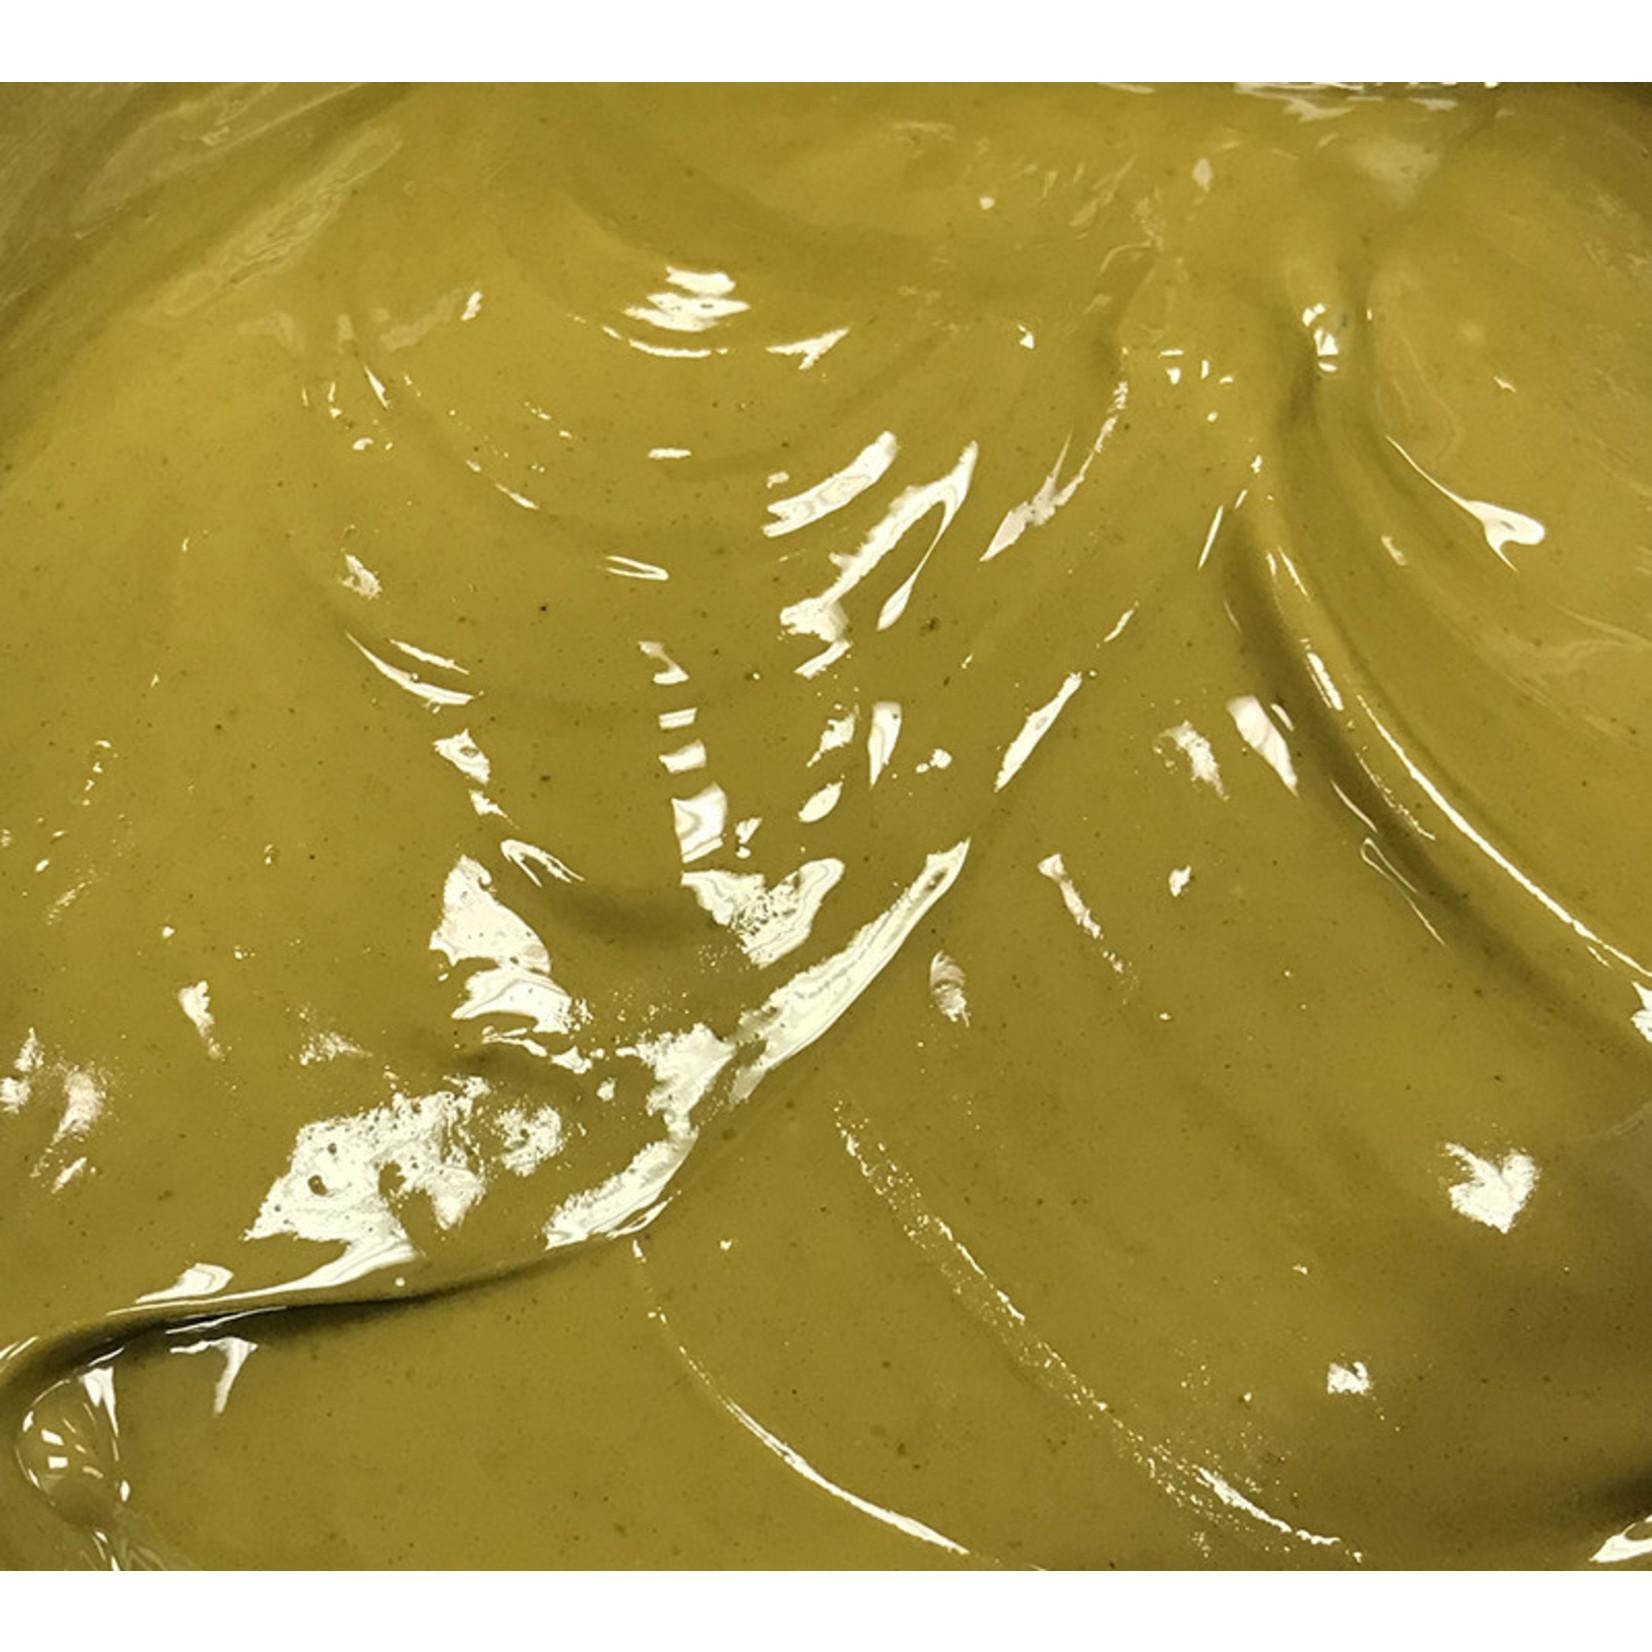 Cacao Barry Cacao Barry - Pistachio Praline Paste 70% - 1kg/2.2 lb, PRO-PI701BY-19A